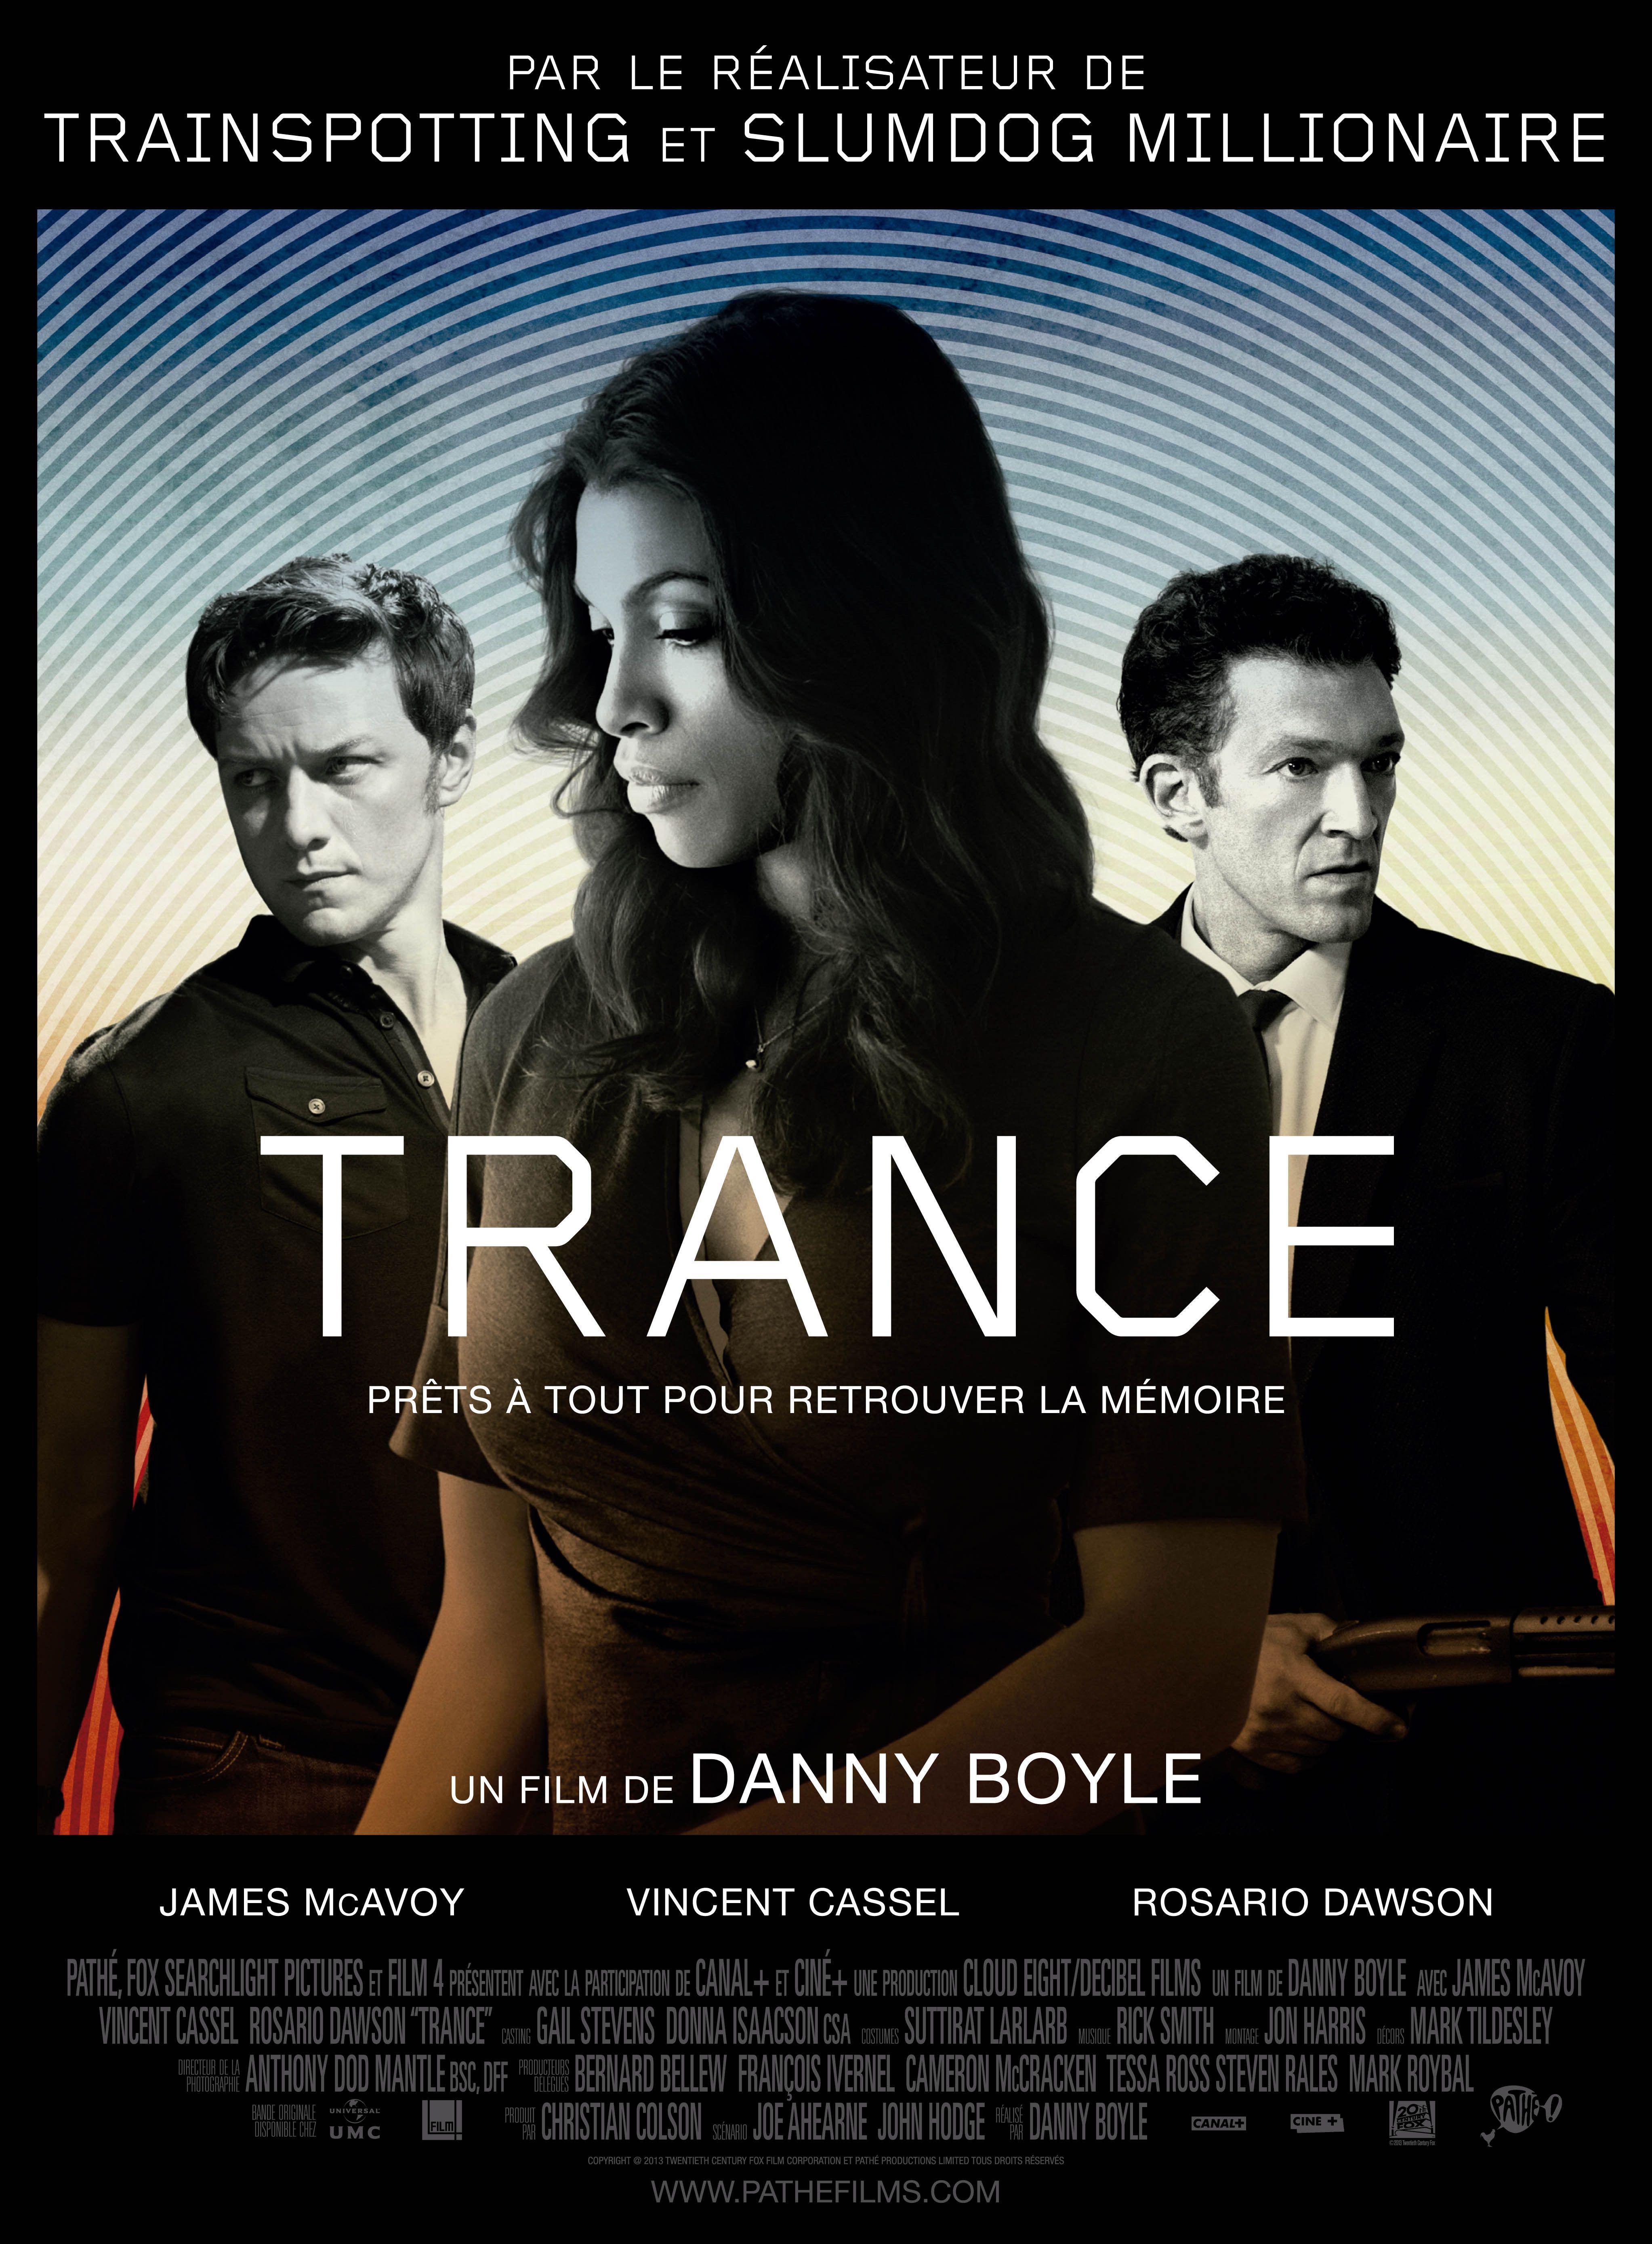 Trance - Film (2013)